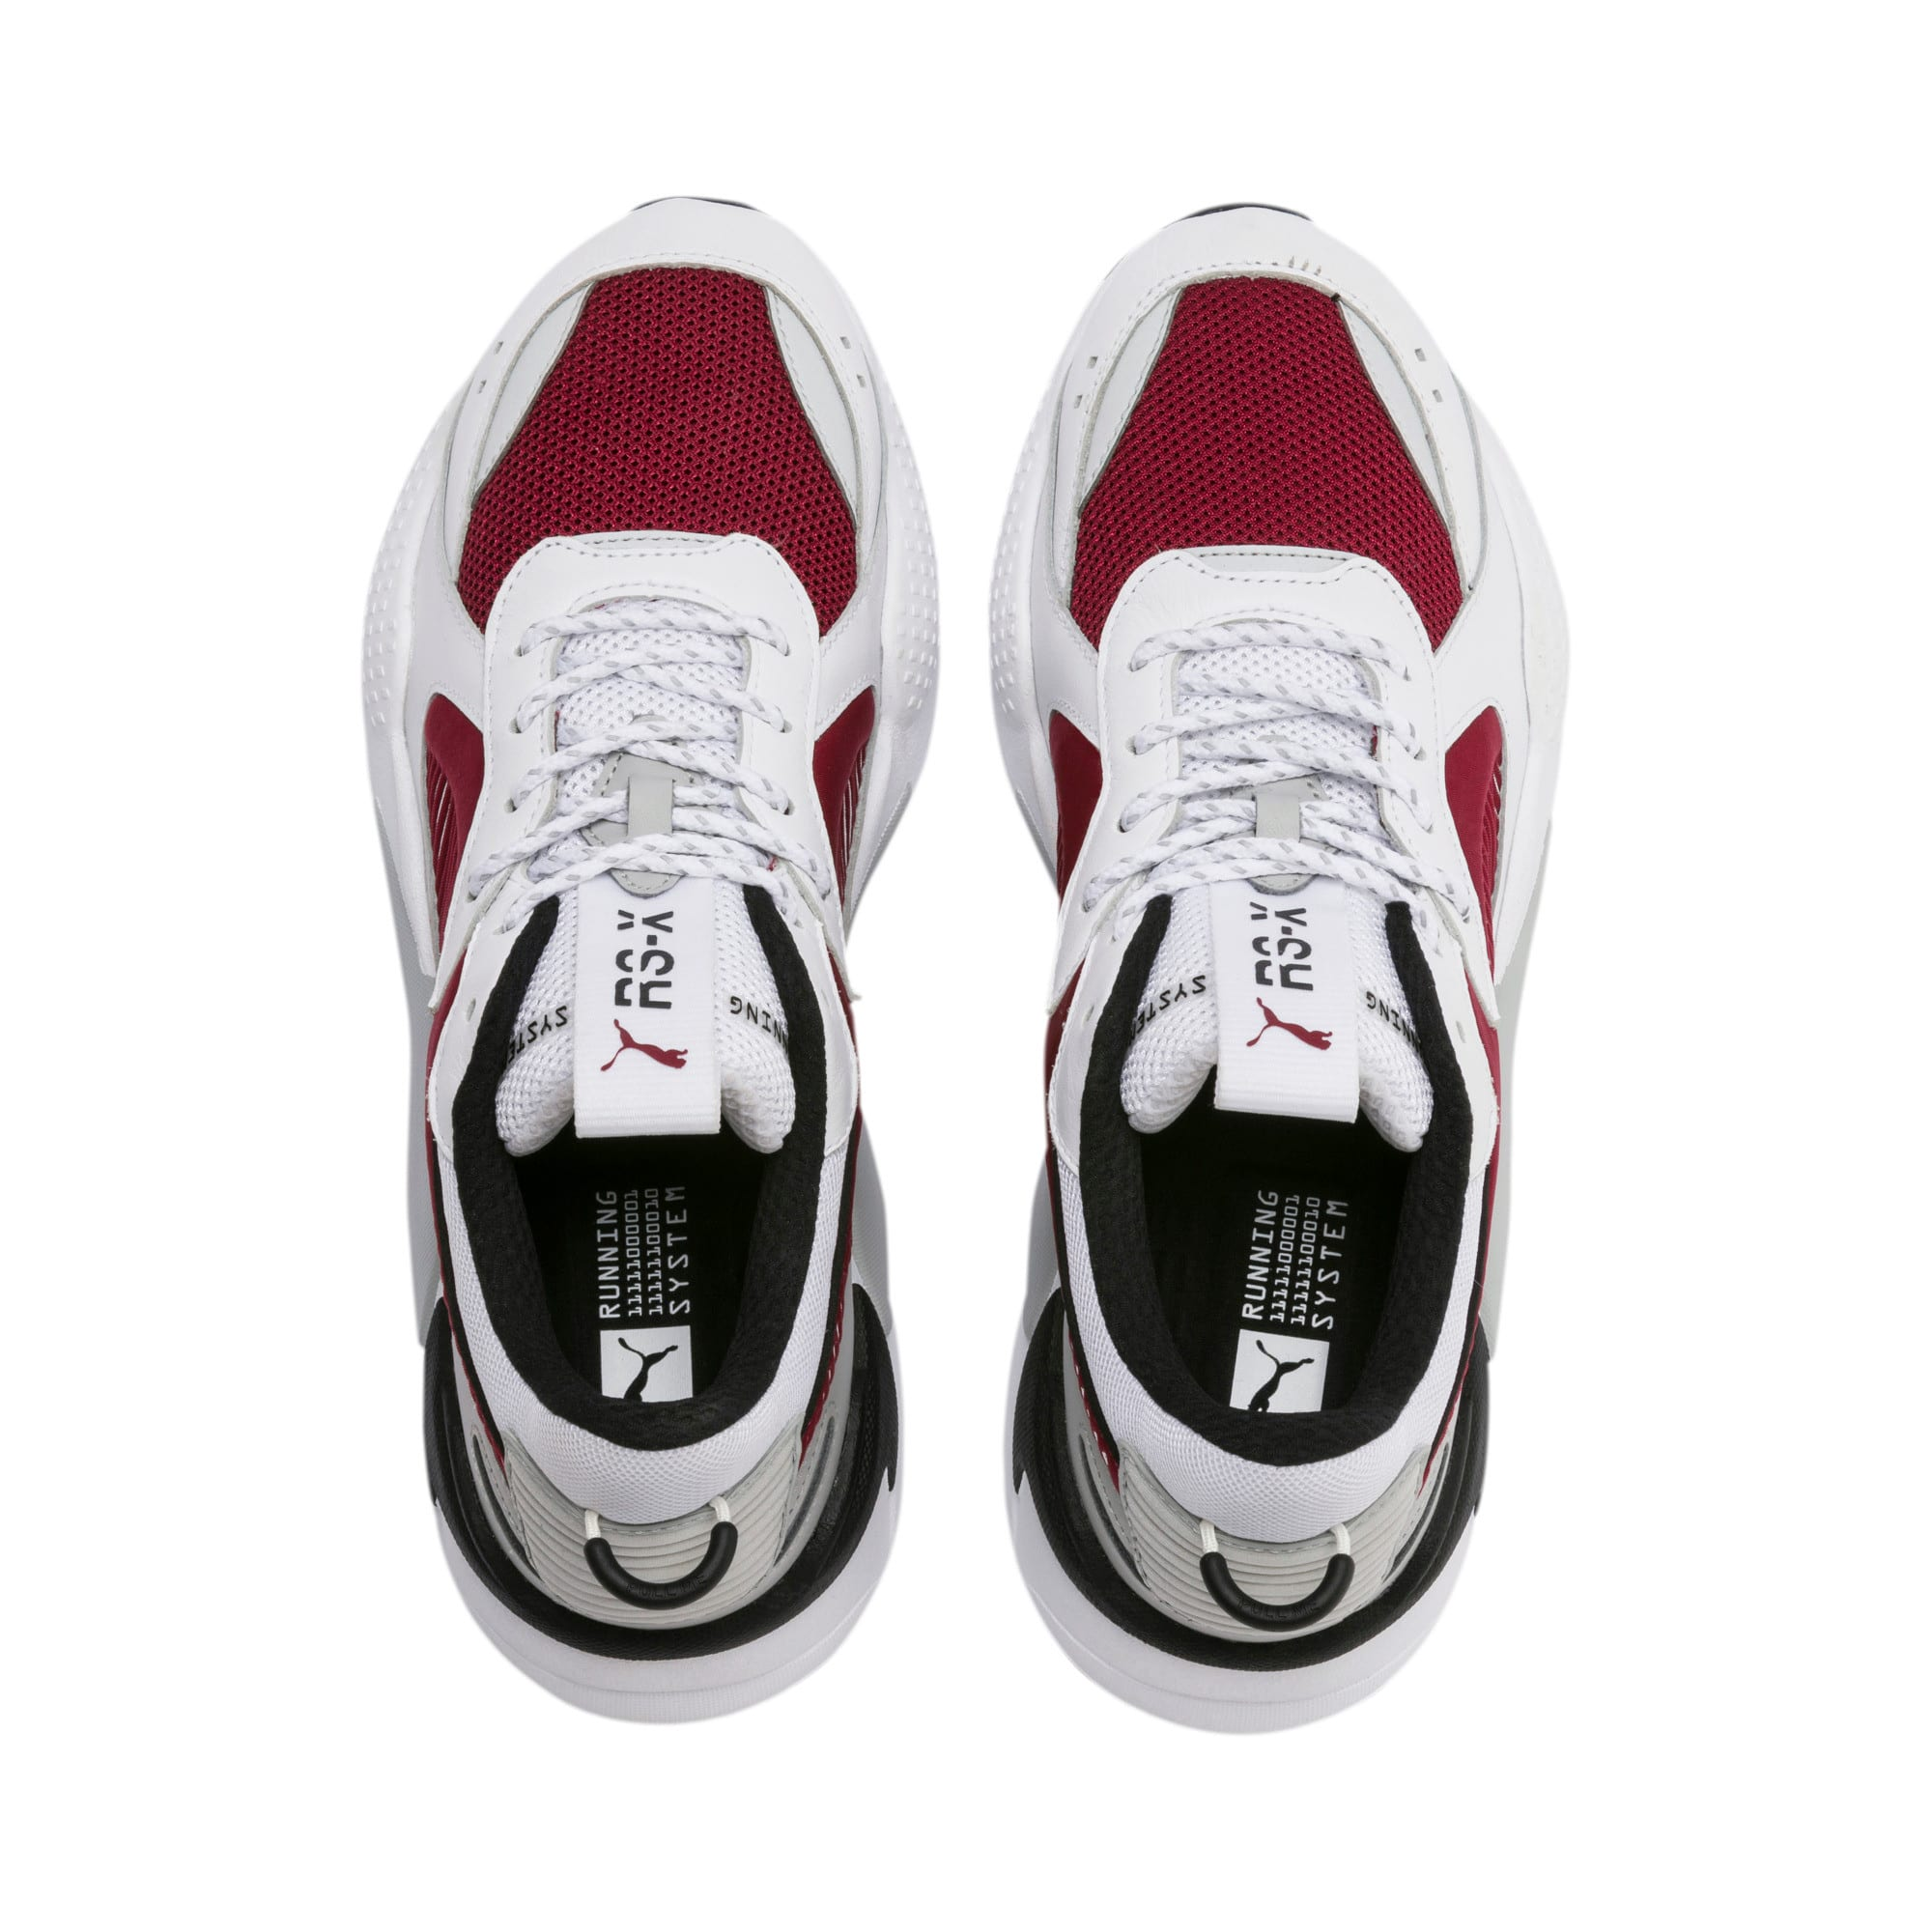 Thumbnail 7 of RS-X Core Sneakers, Puma White-Rhubarb, medium